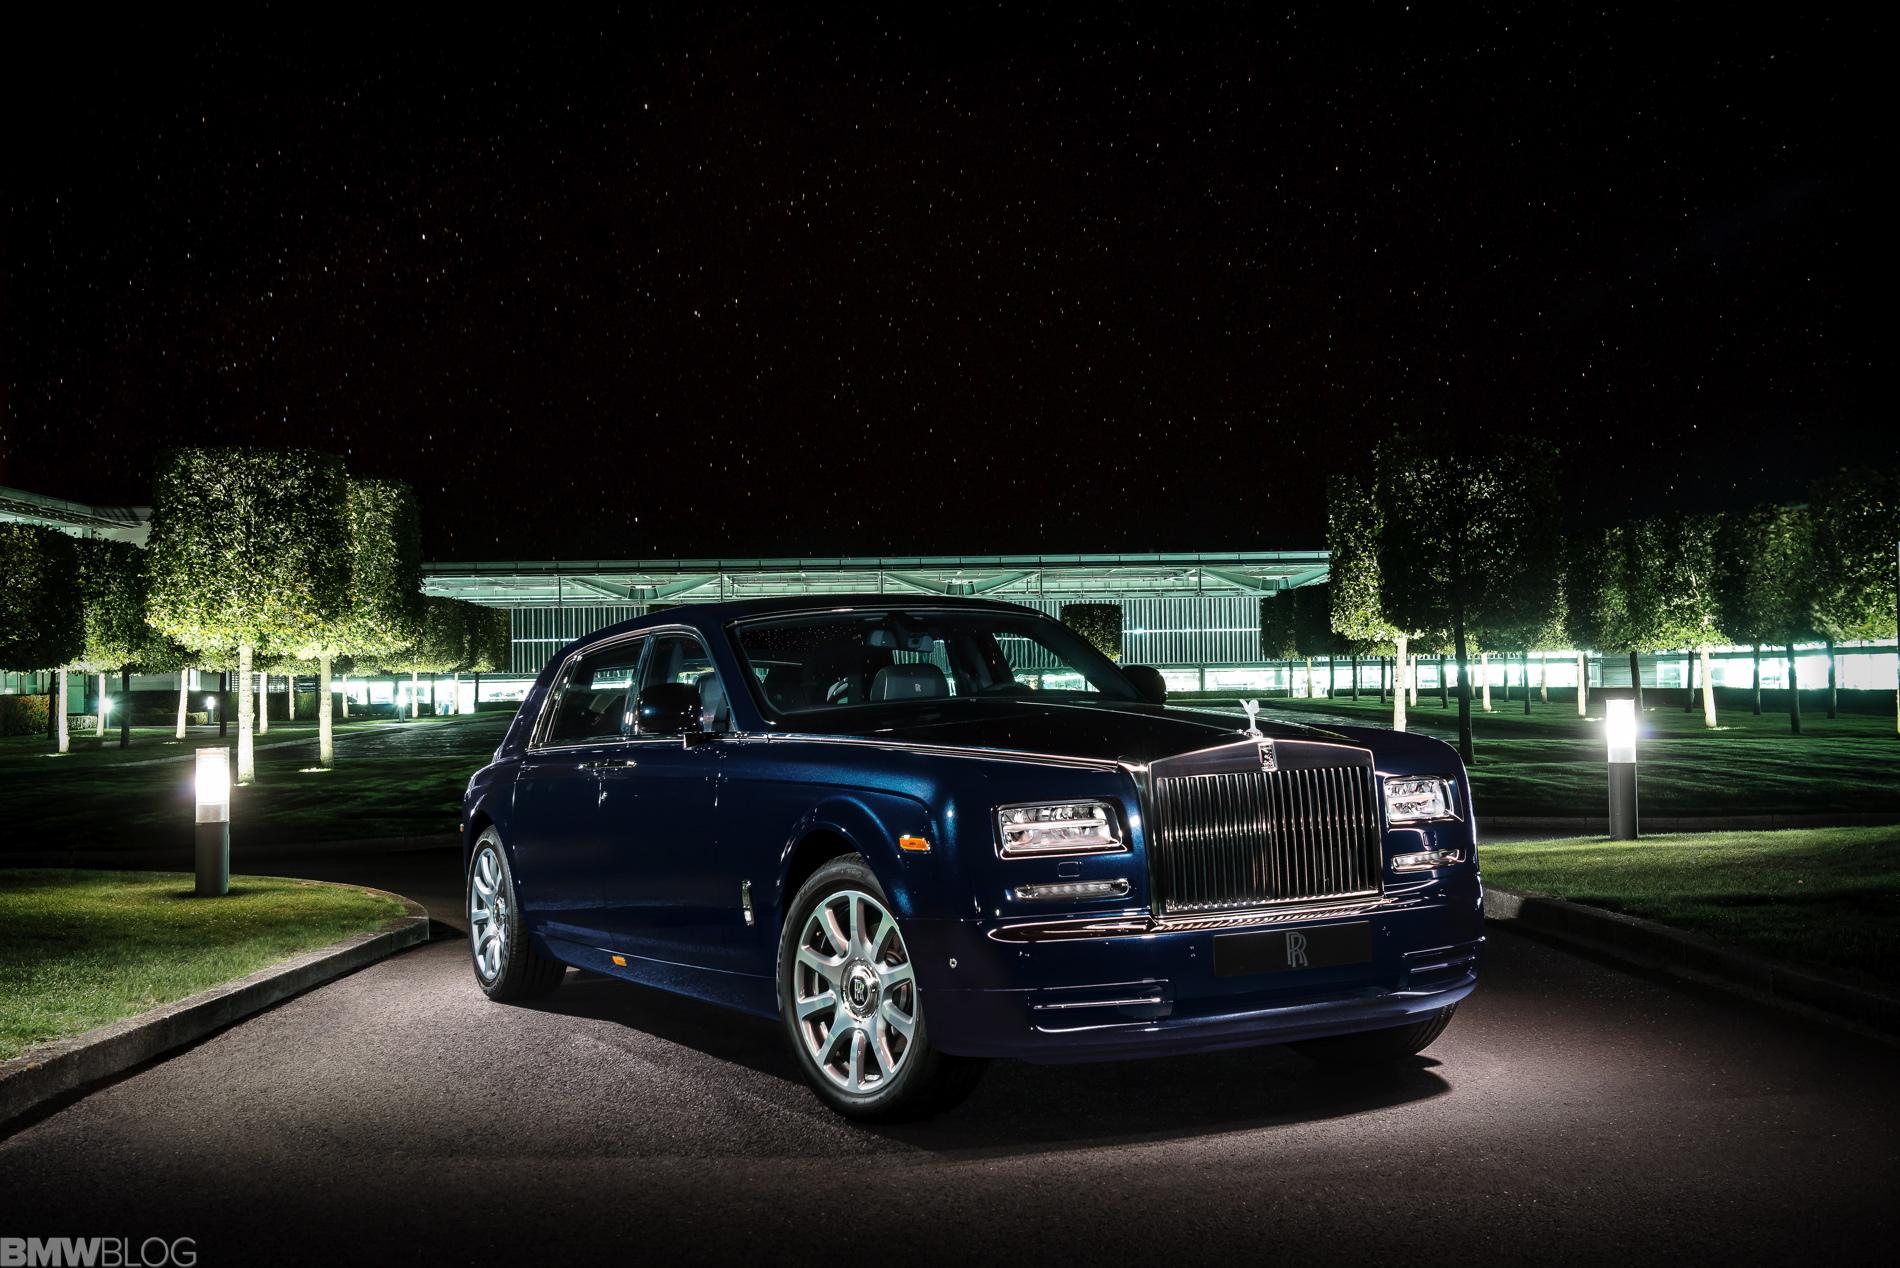 Rolls Royce Phantom Best Luxury Cars: ROLLS-ROYCE PHANTOM DECLARED WORLD'S BEST SUPER-LUXURY CAR